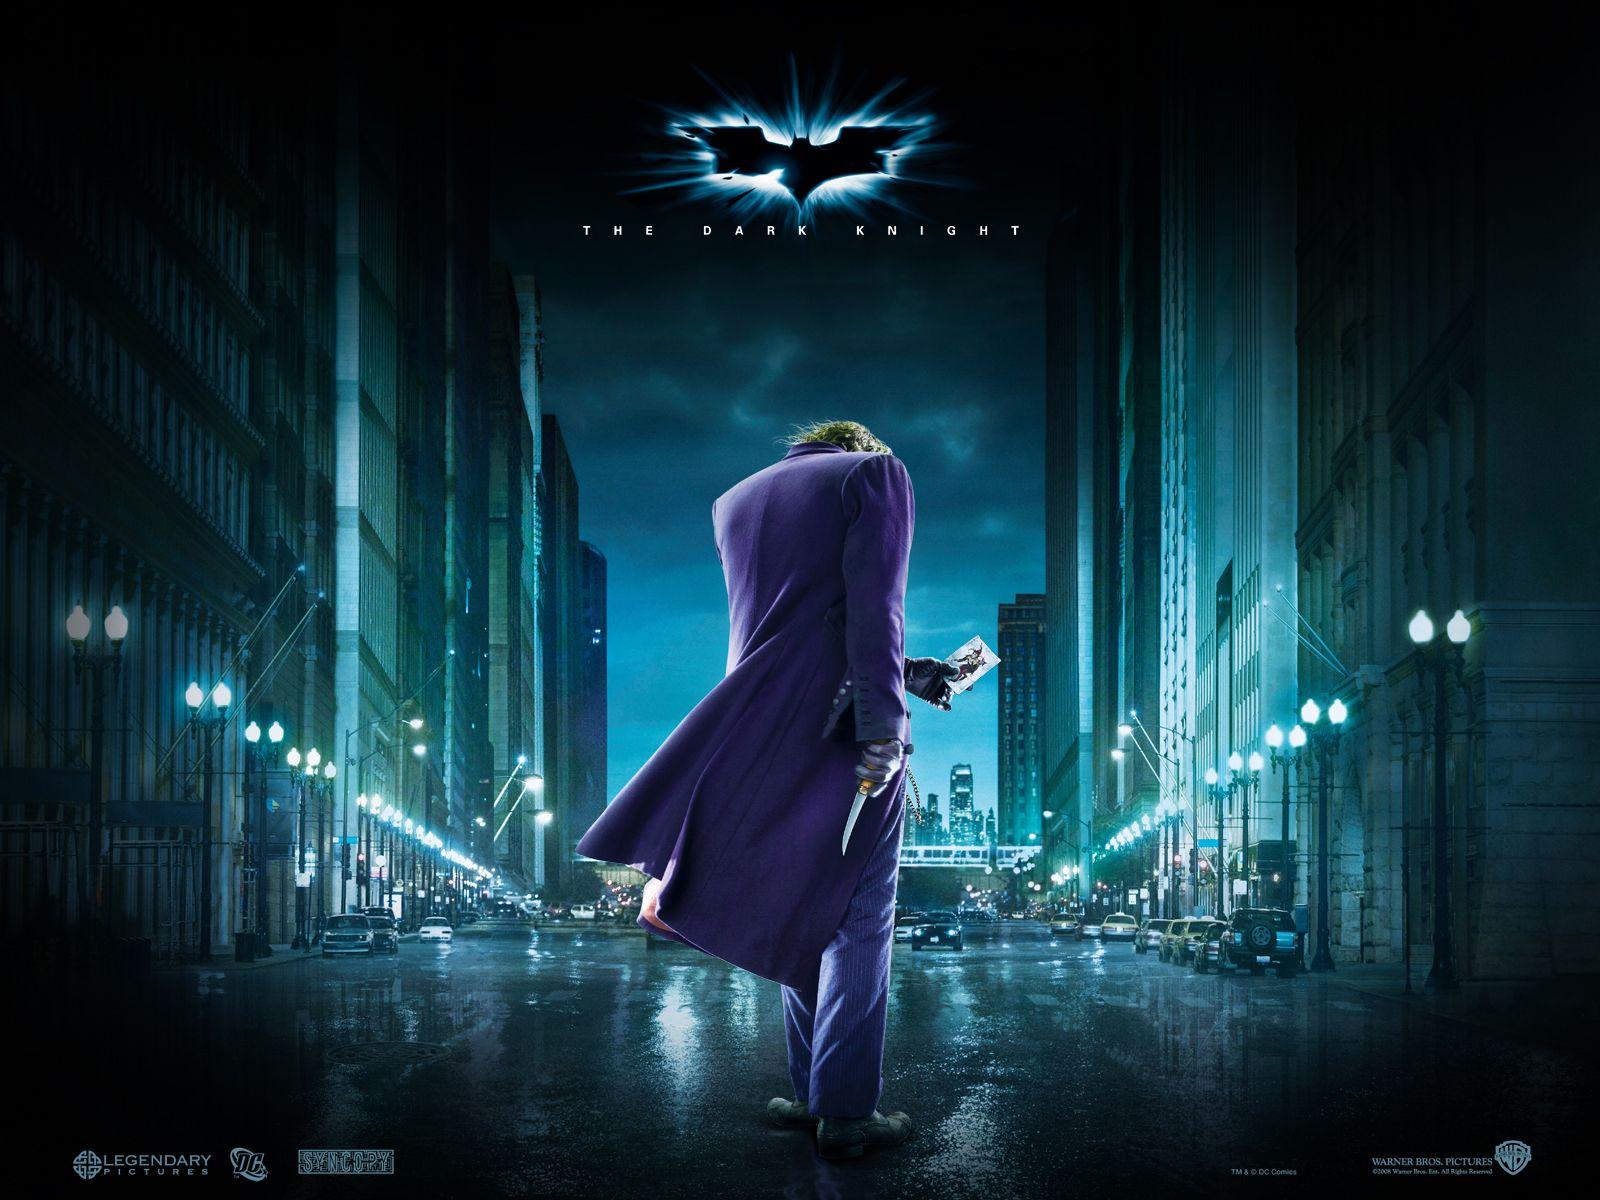 The Dark Knight Rules Amazing Batman Desktop Wallpapers Joker Dark Knight Dark Knight Batman The Dark Knight